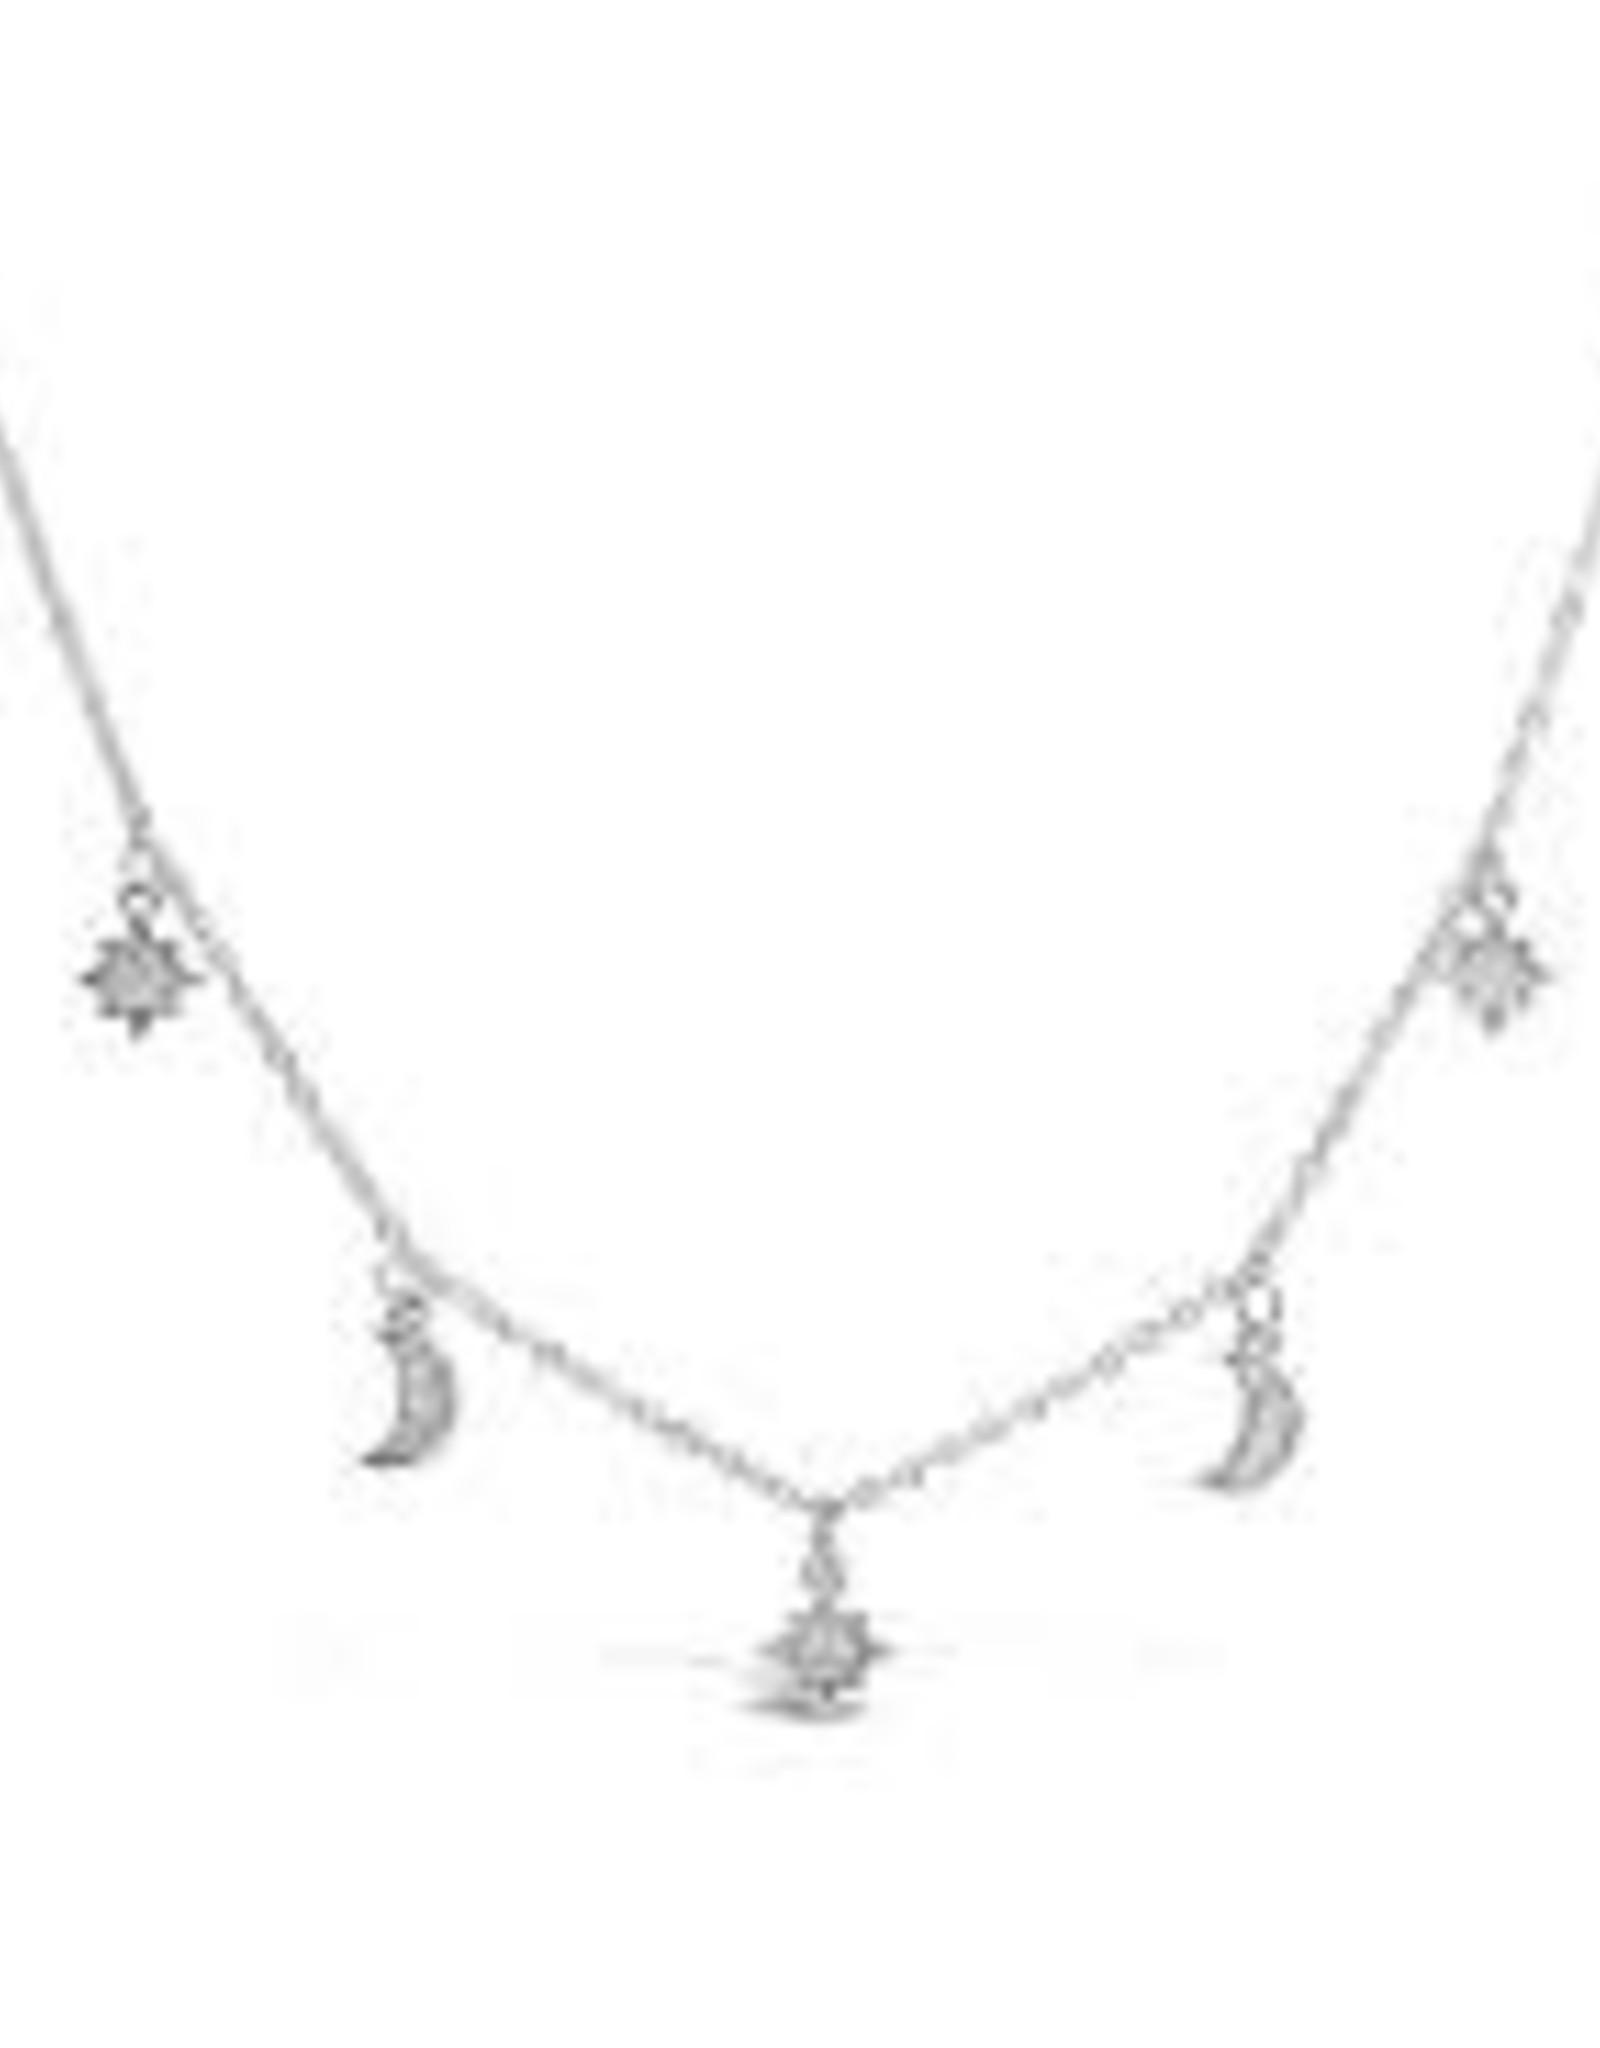 Stia Jewelry Necklace - Moon Starburst